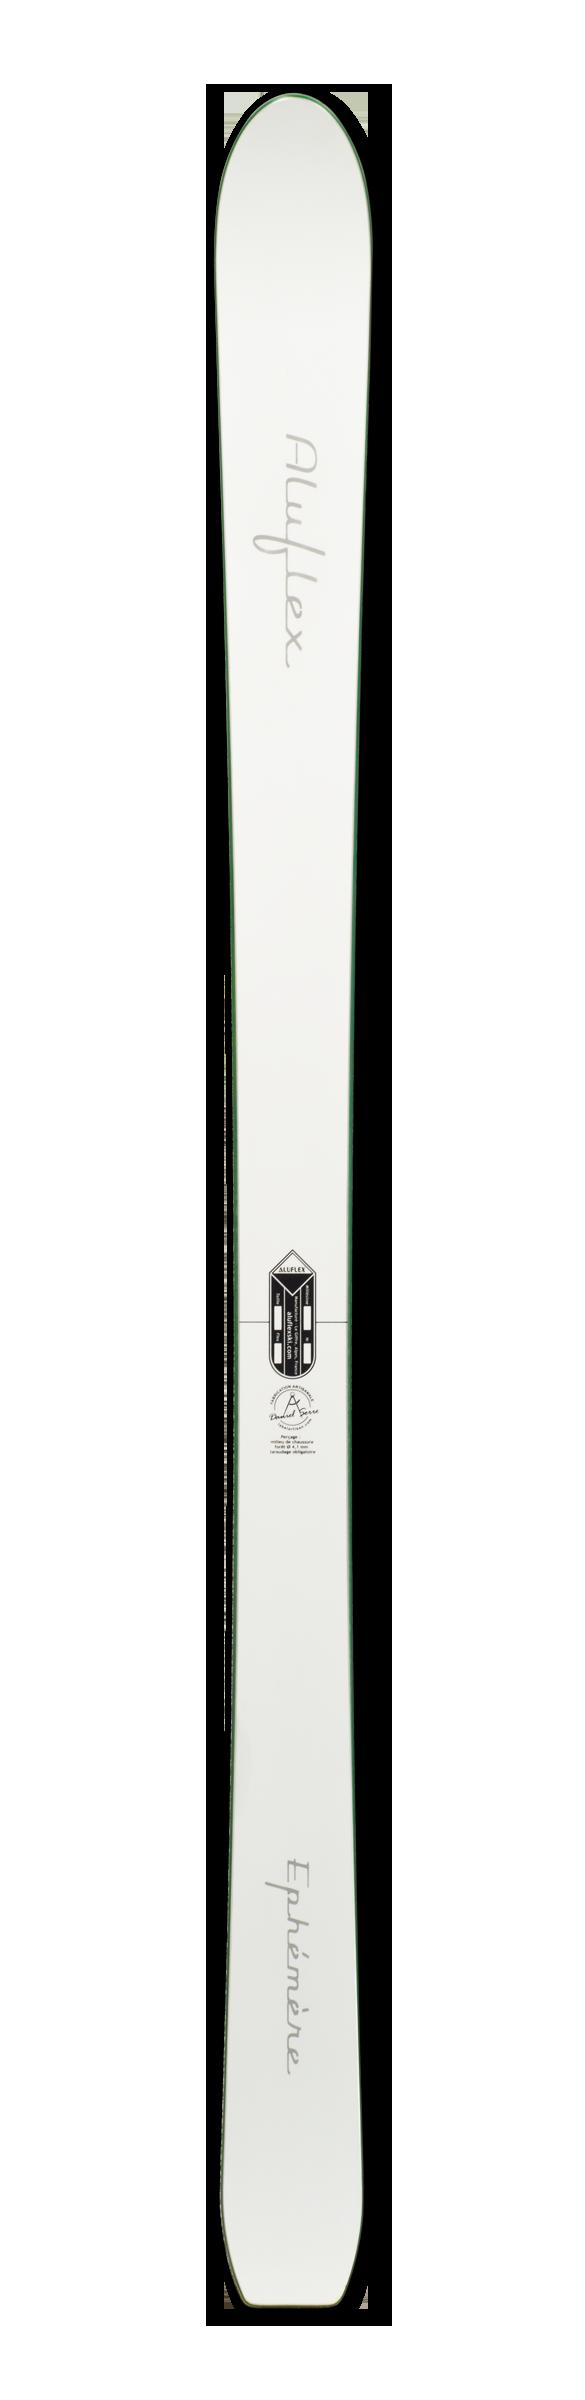 Ski Aluflex Éphémère blanc vert